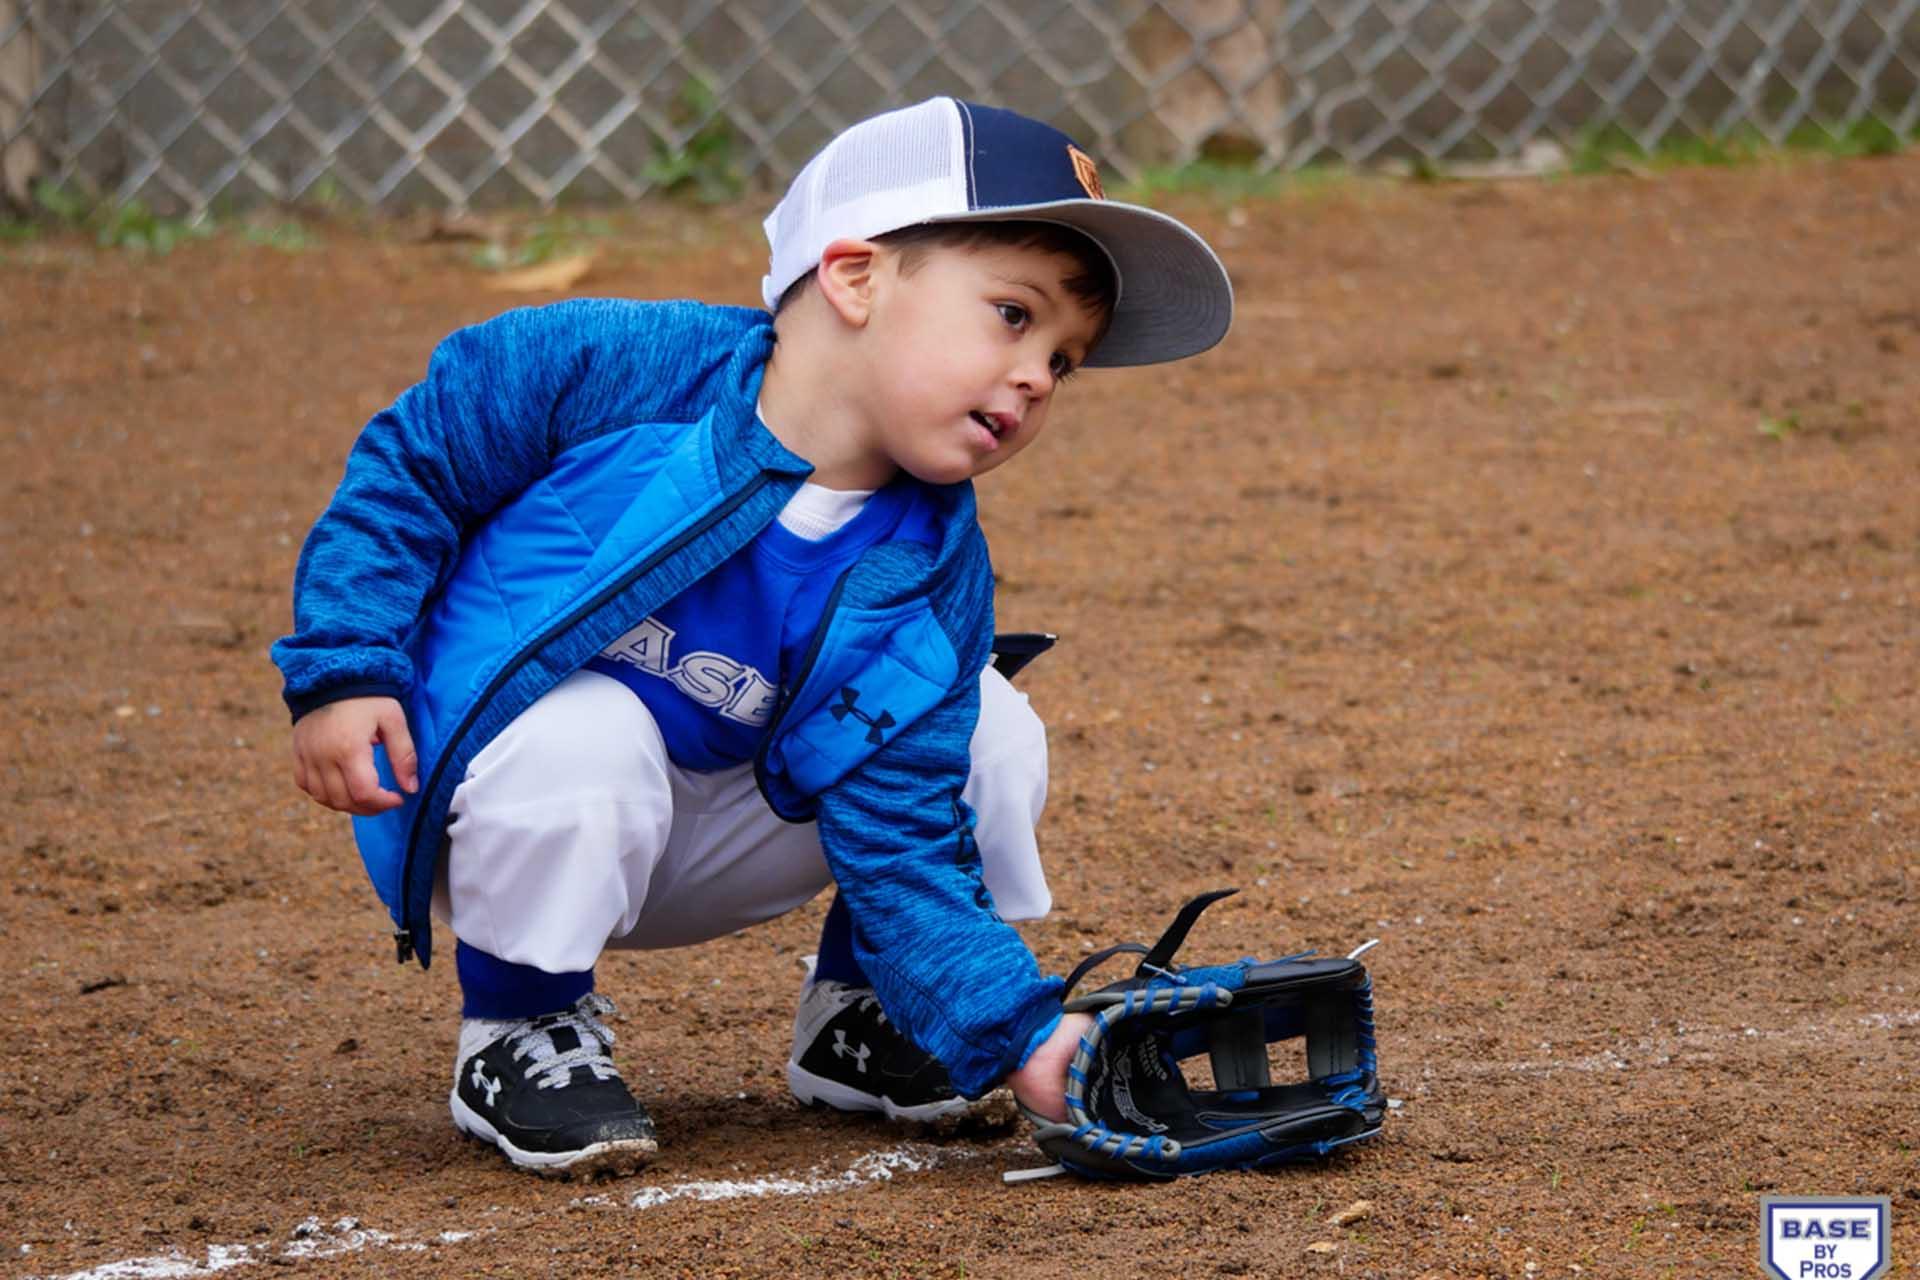 Little Boy Prepares to Field a Baseball